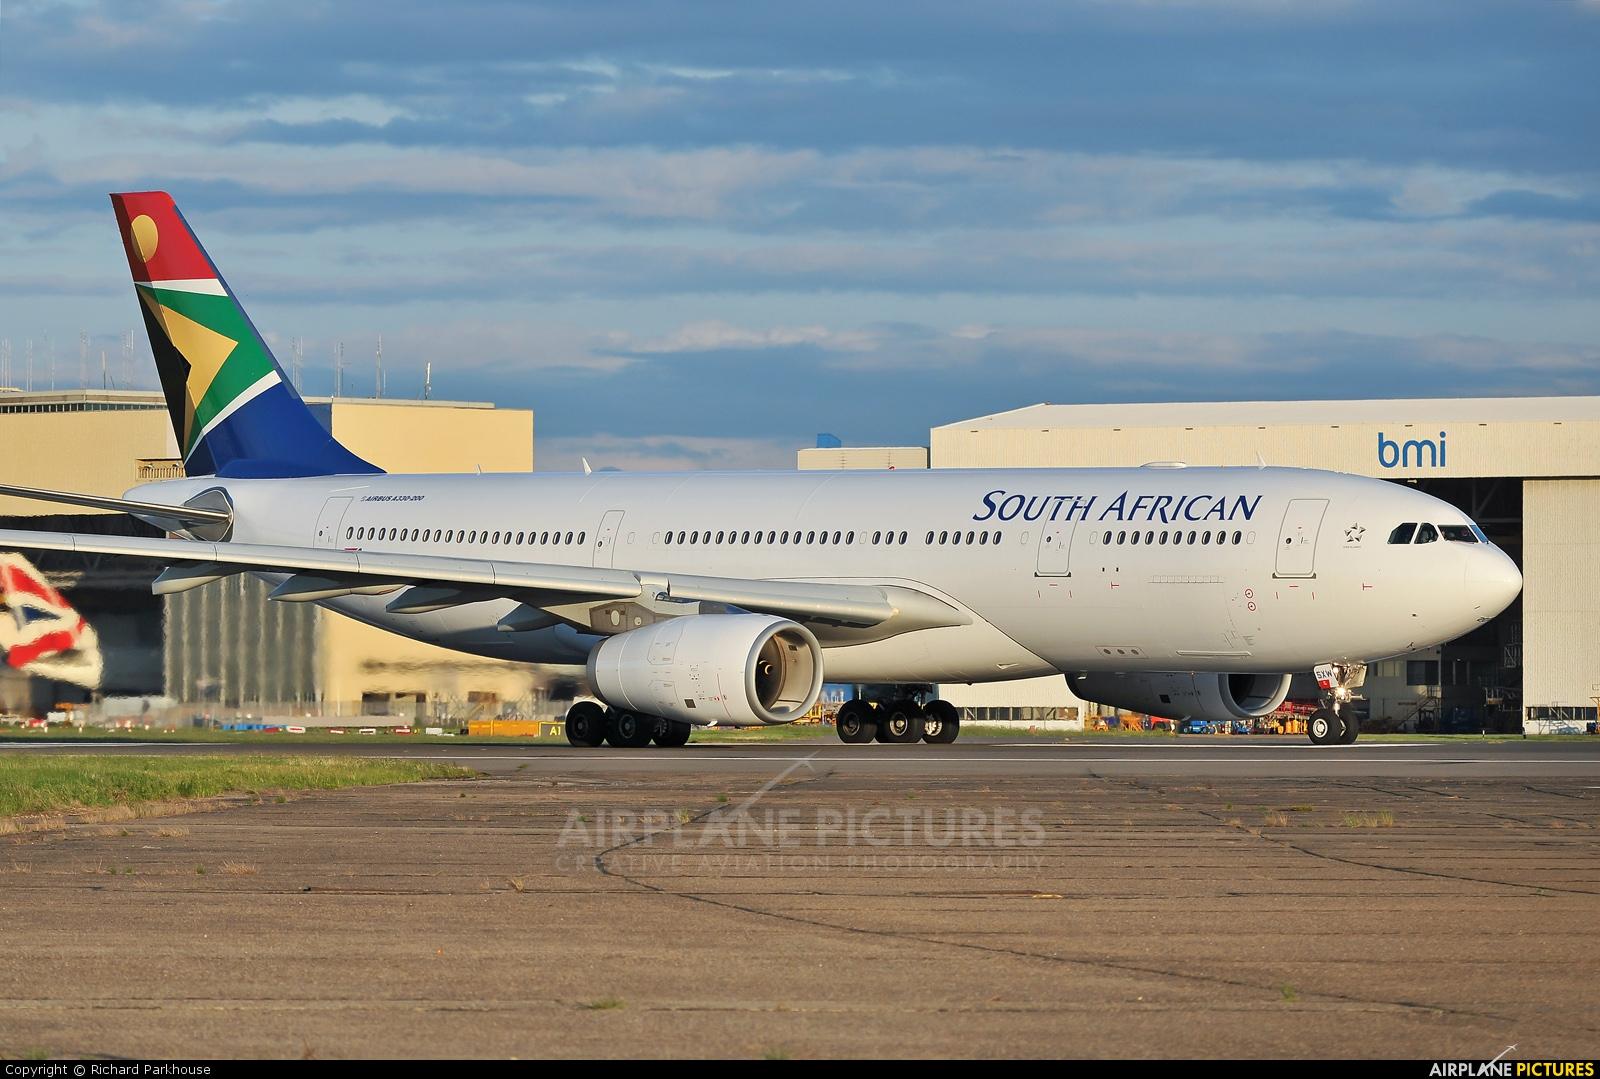 South African Airways ZS-SXW aircraft at London - Heathrow